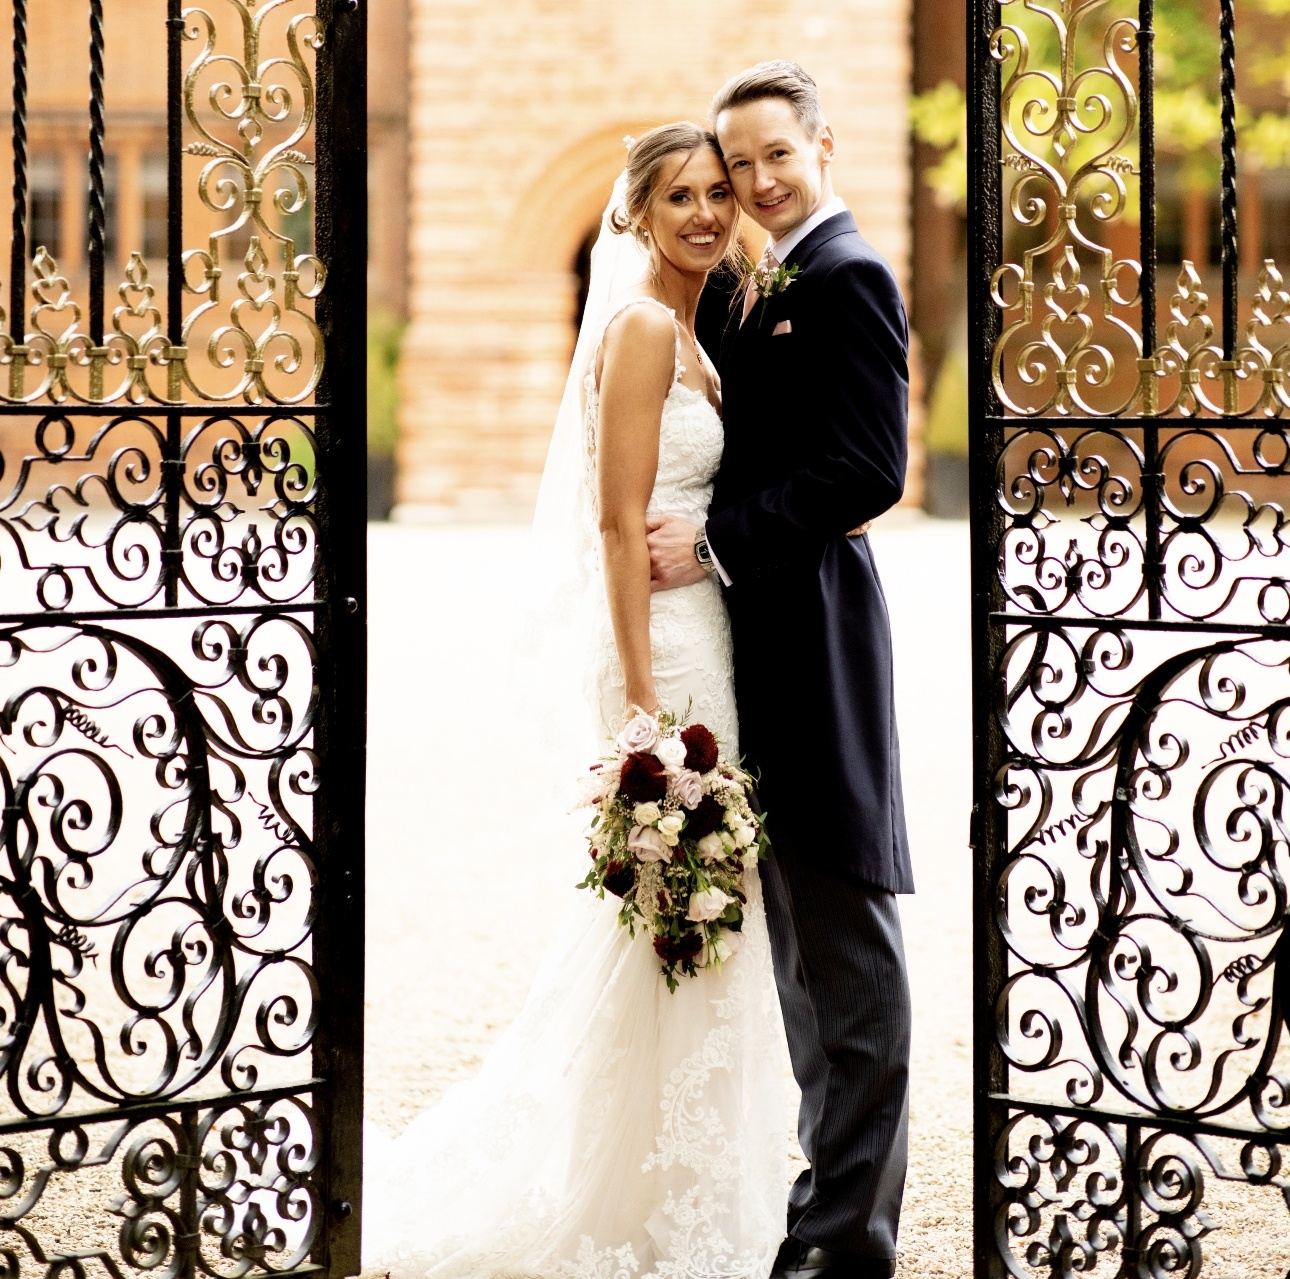 Couple at gates